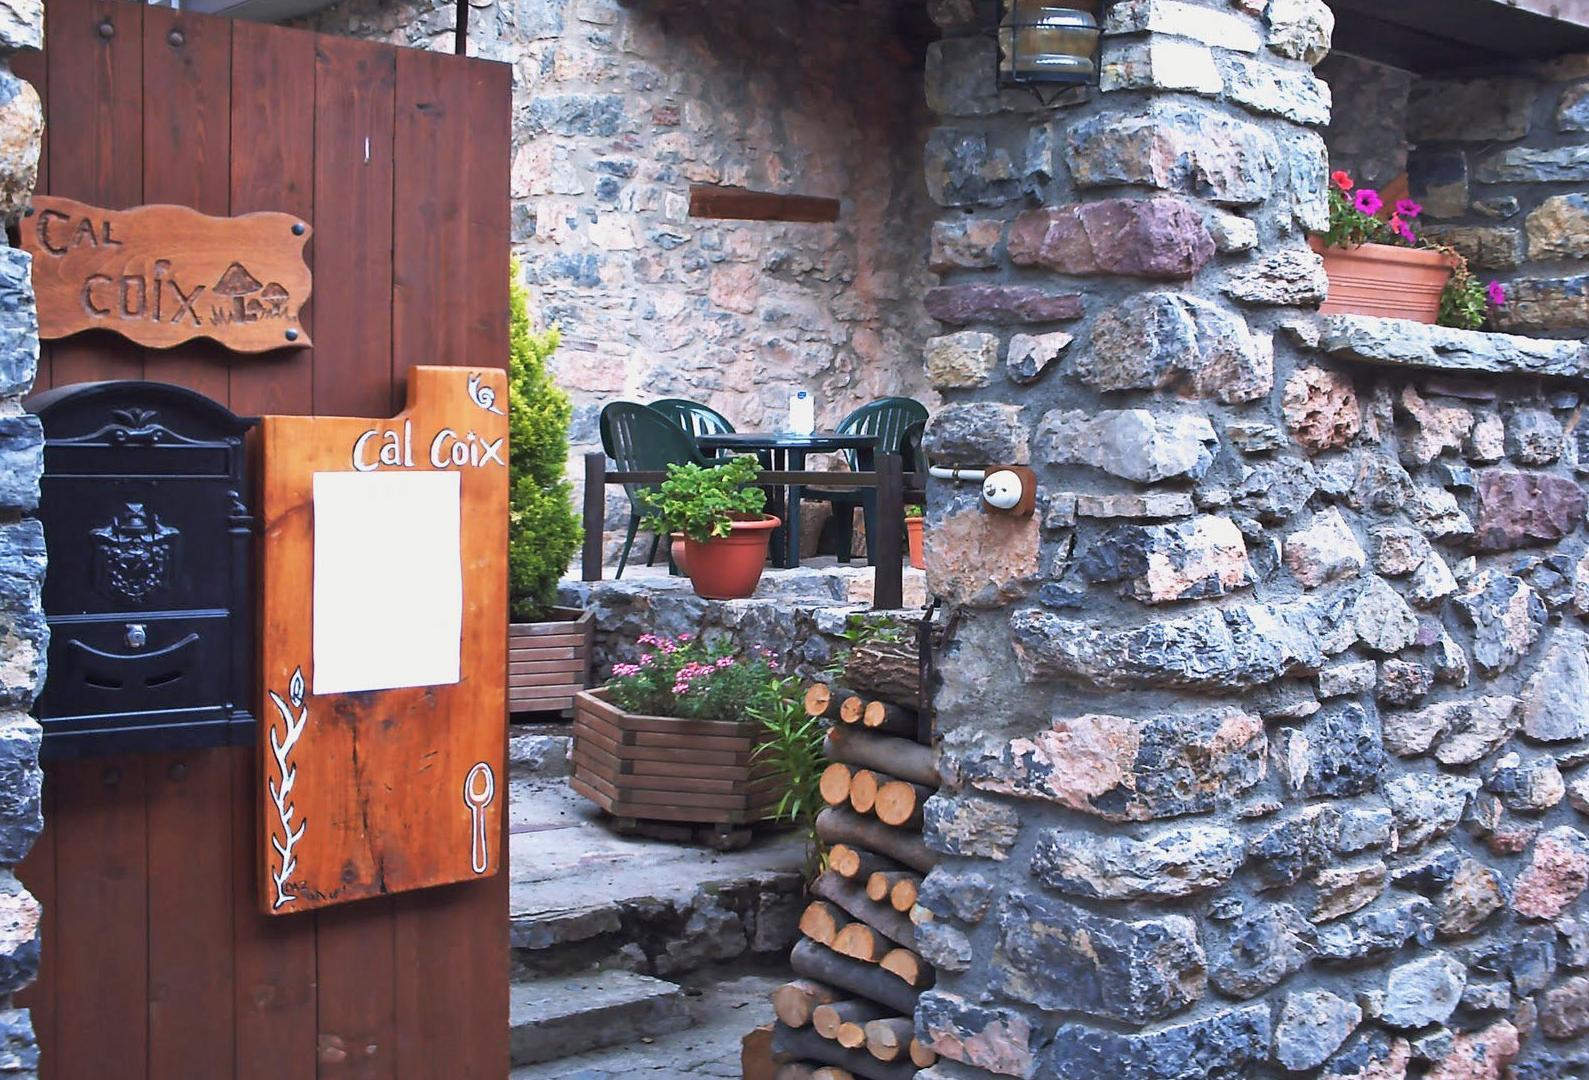 Restaurante Cal Coix - Entrada al restaurante